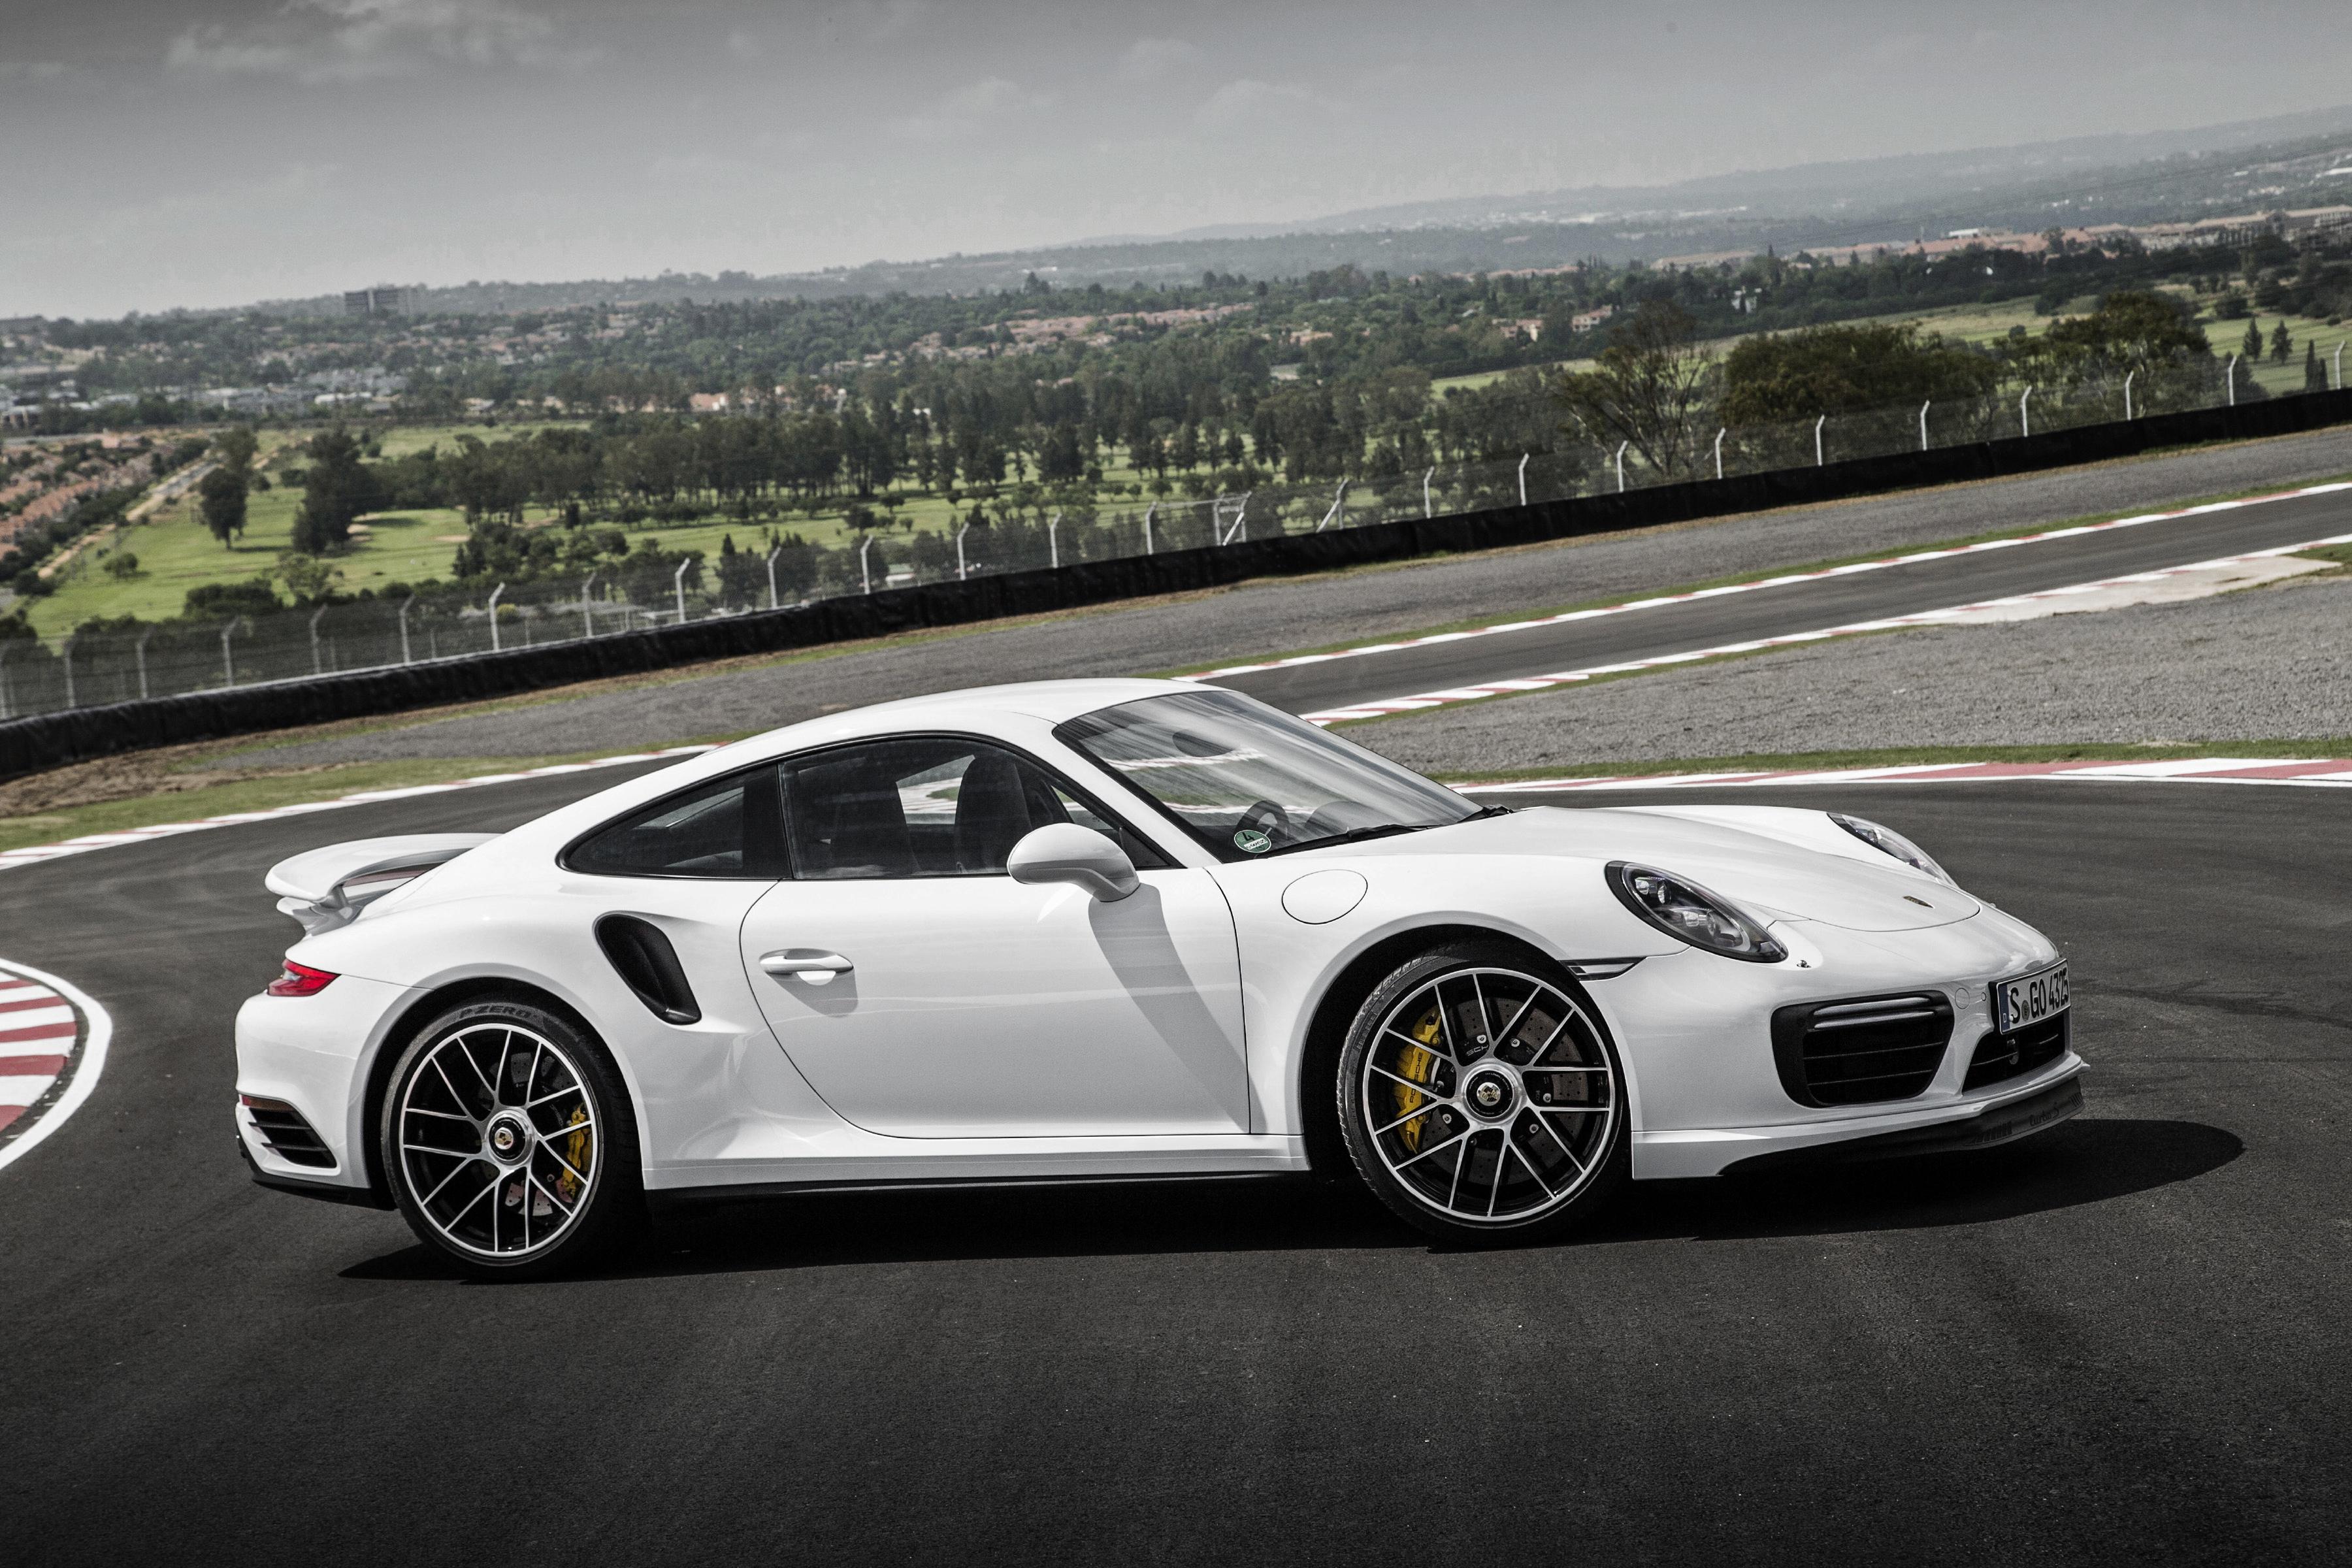 Porsche 911 Turbo S Hd Wallpaper Background Image 3600x2400